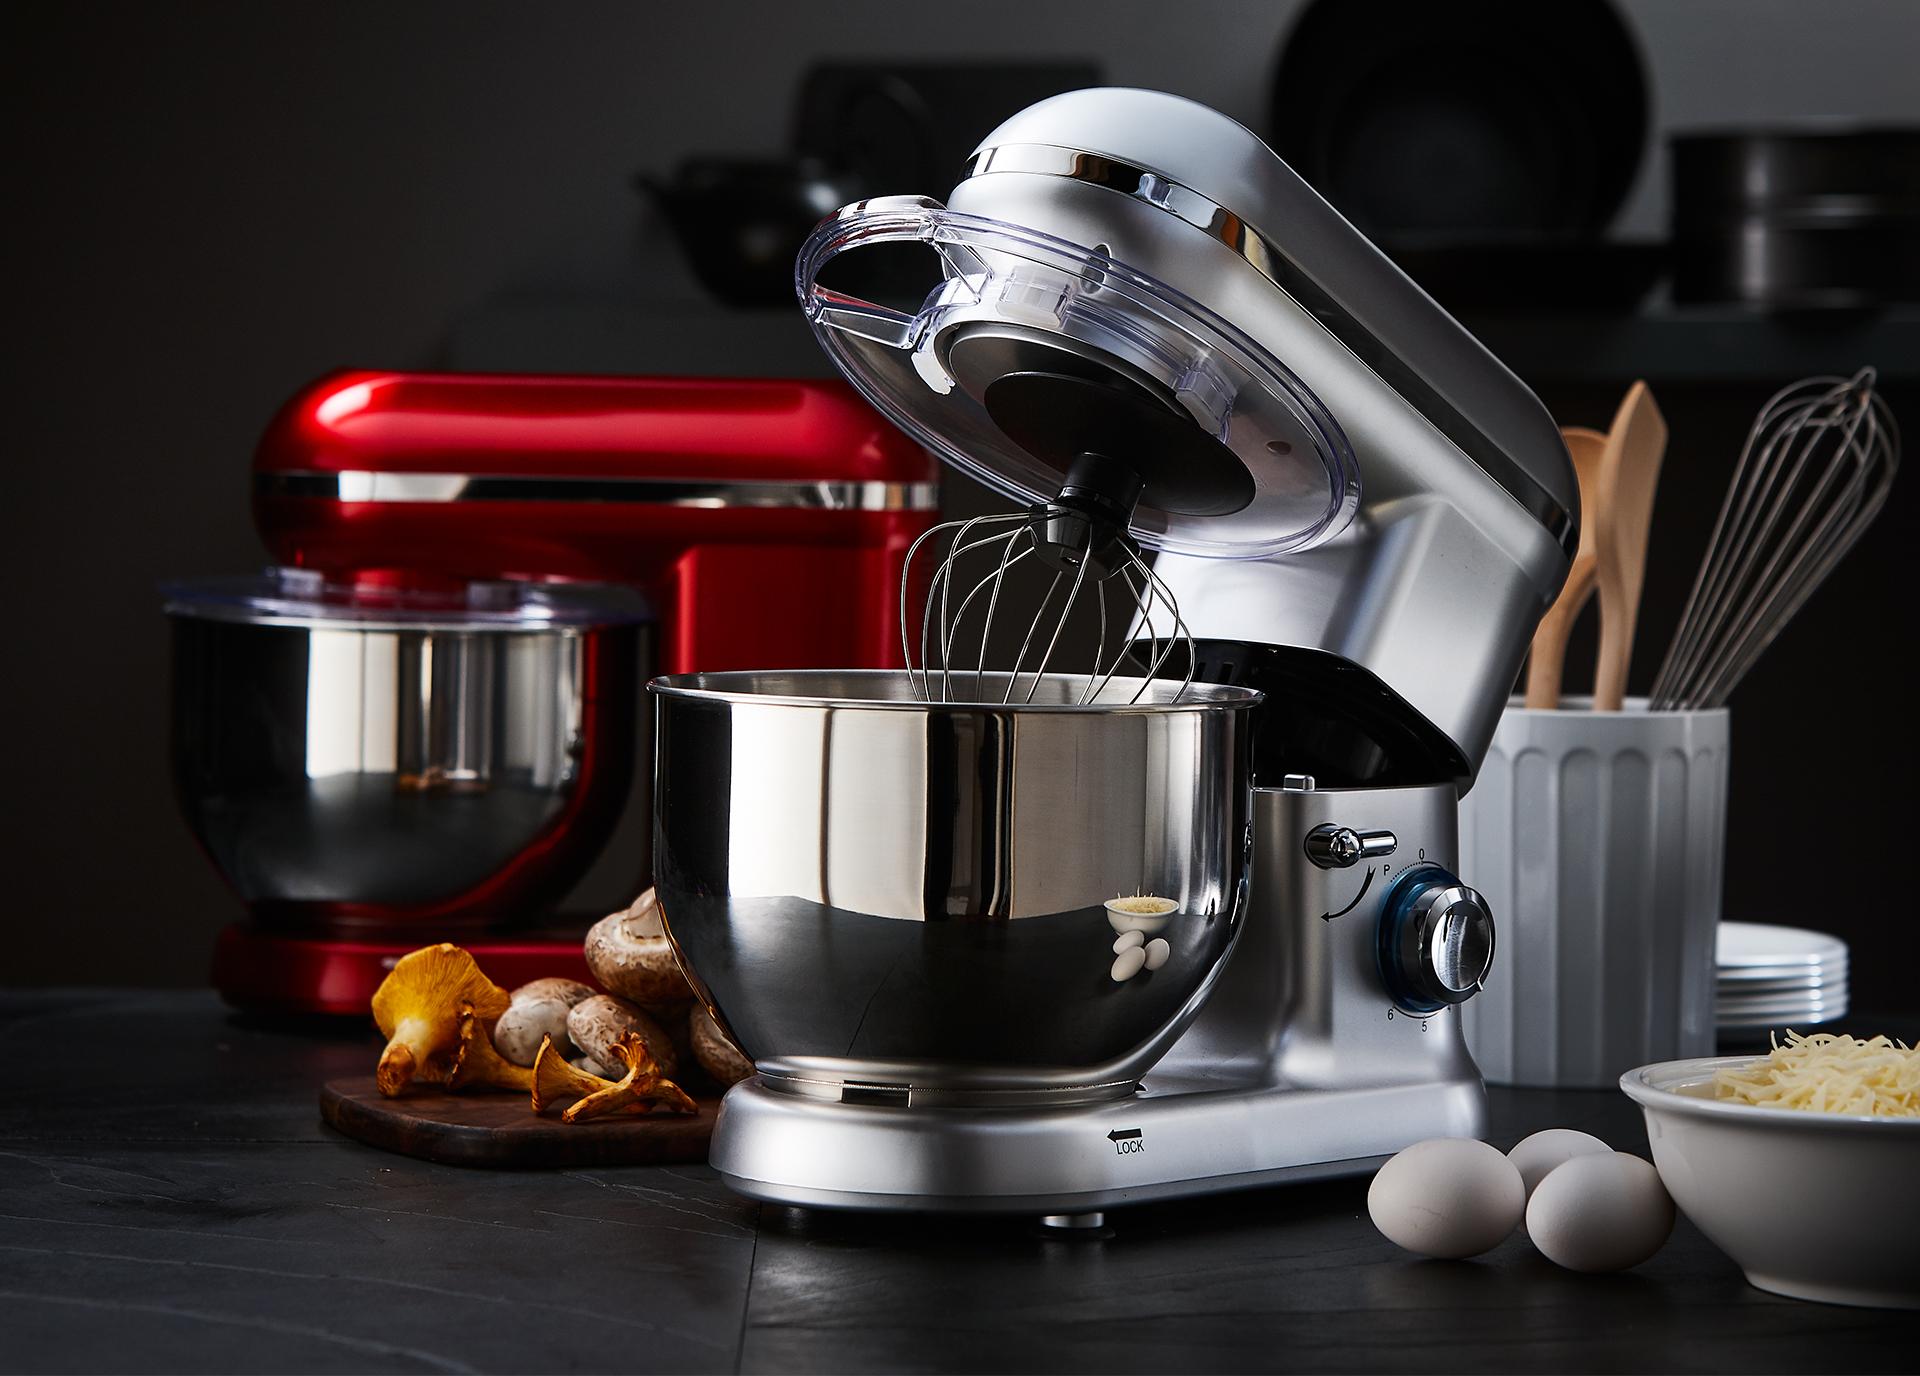 product-photographer-stokes-kitchen-appliance-tango-photography